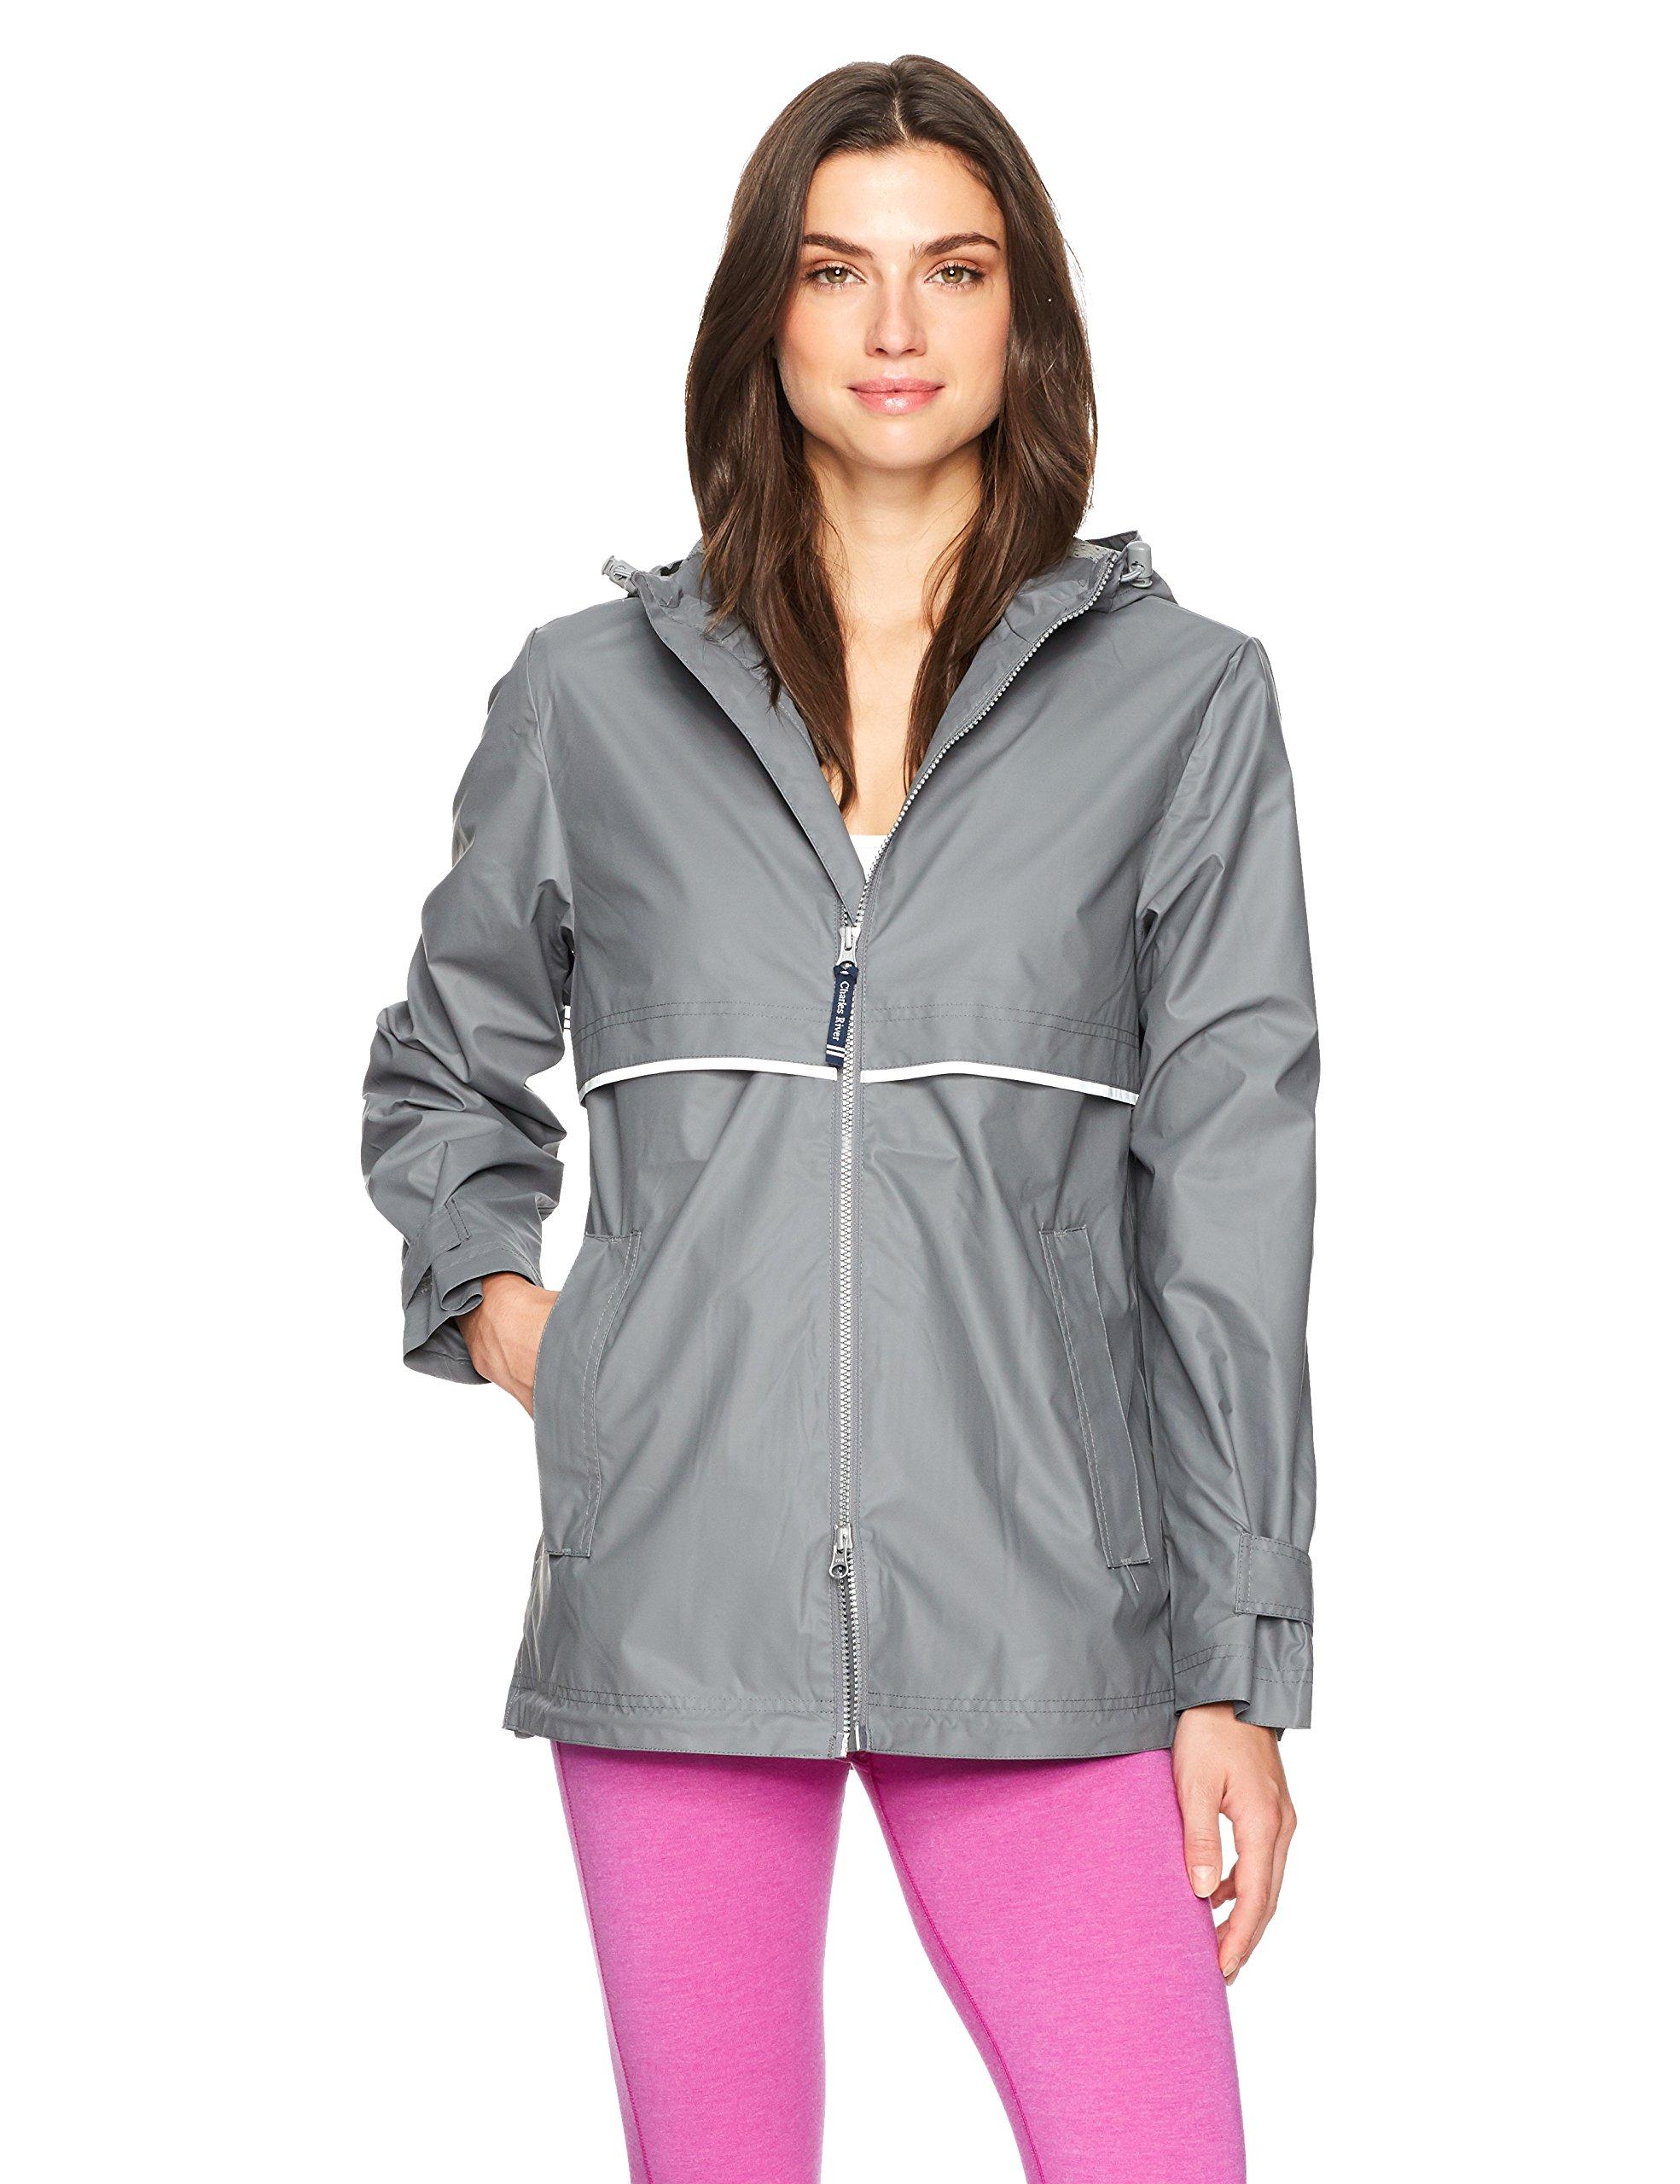 Charles River Apparel Women's New Englander Waterproof Rain Jacket, Grey/Reflective, S by Charles River Apparel